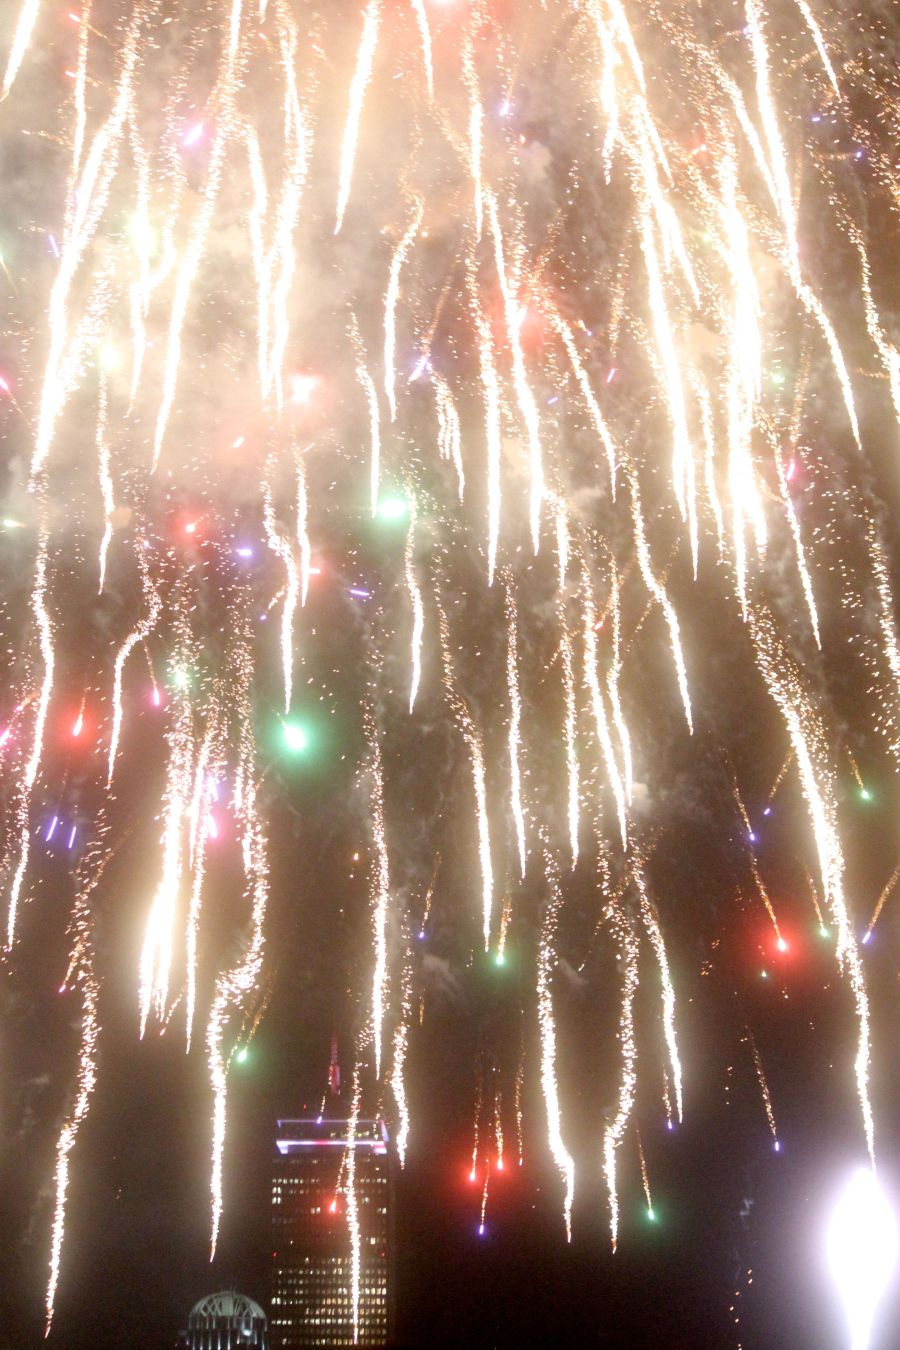 boston july 3 2014 fireworks charles river 4